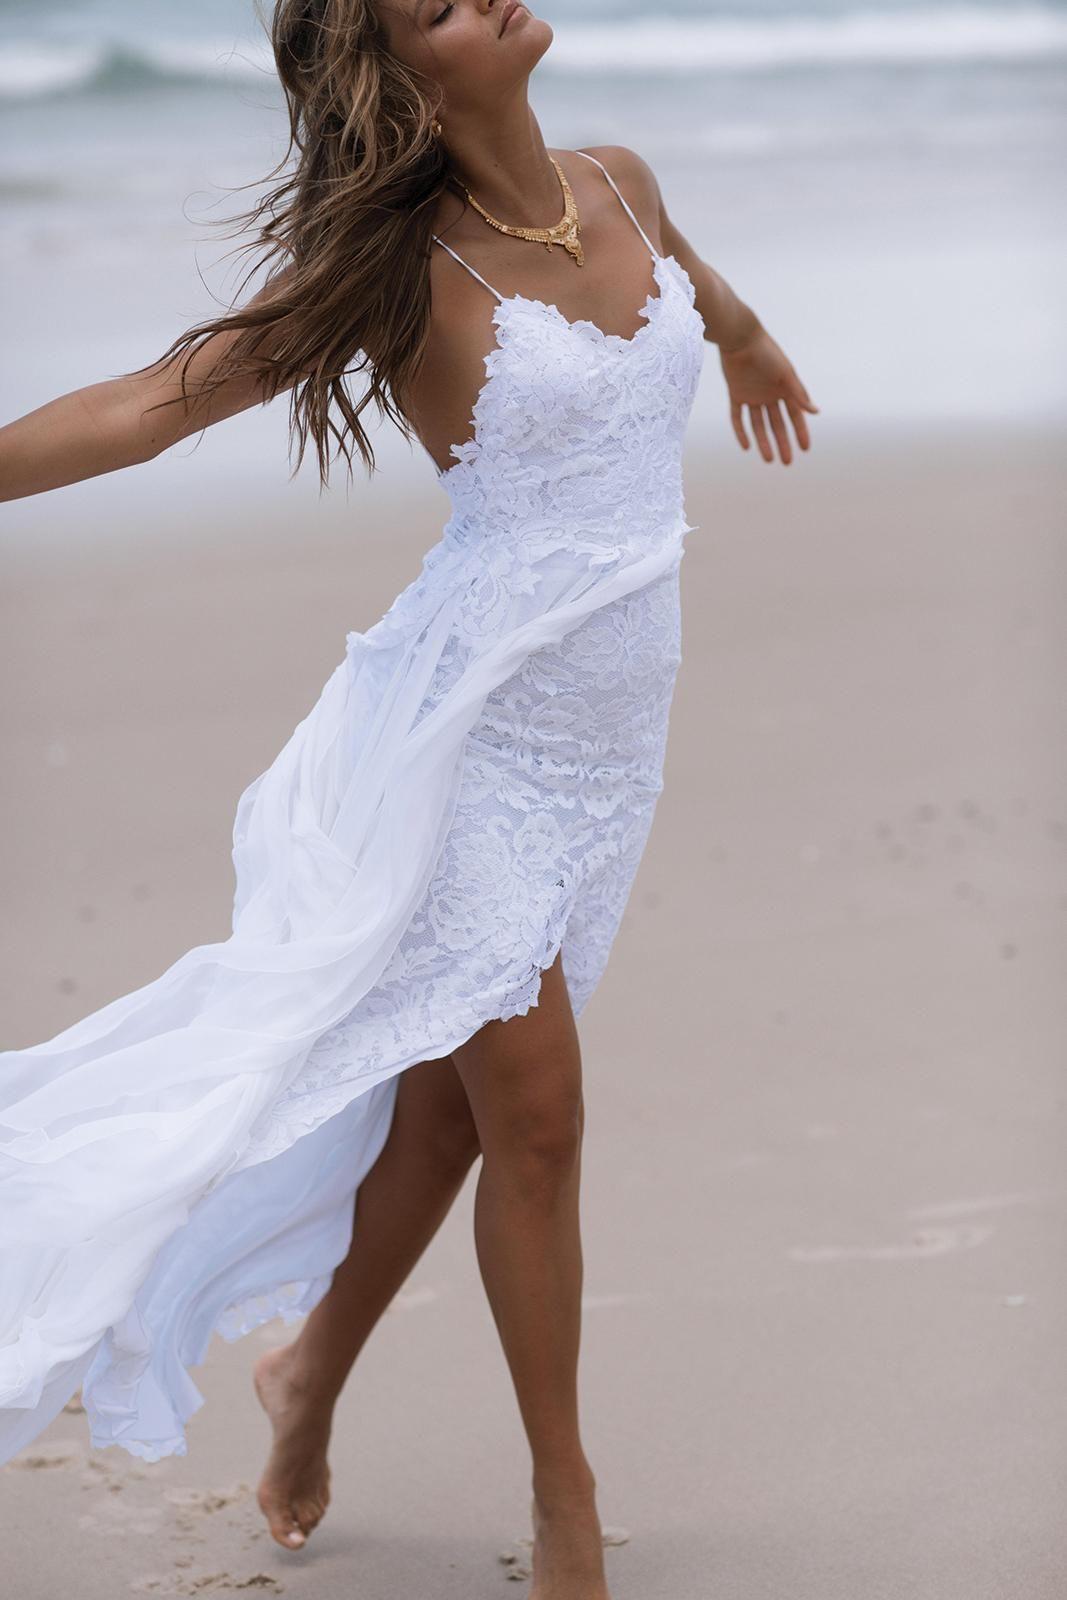 Shop Hollie 2.0 Beach style wedding dresses, Casual